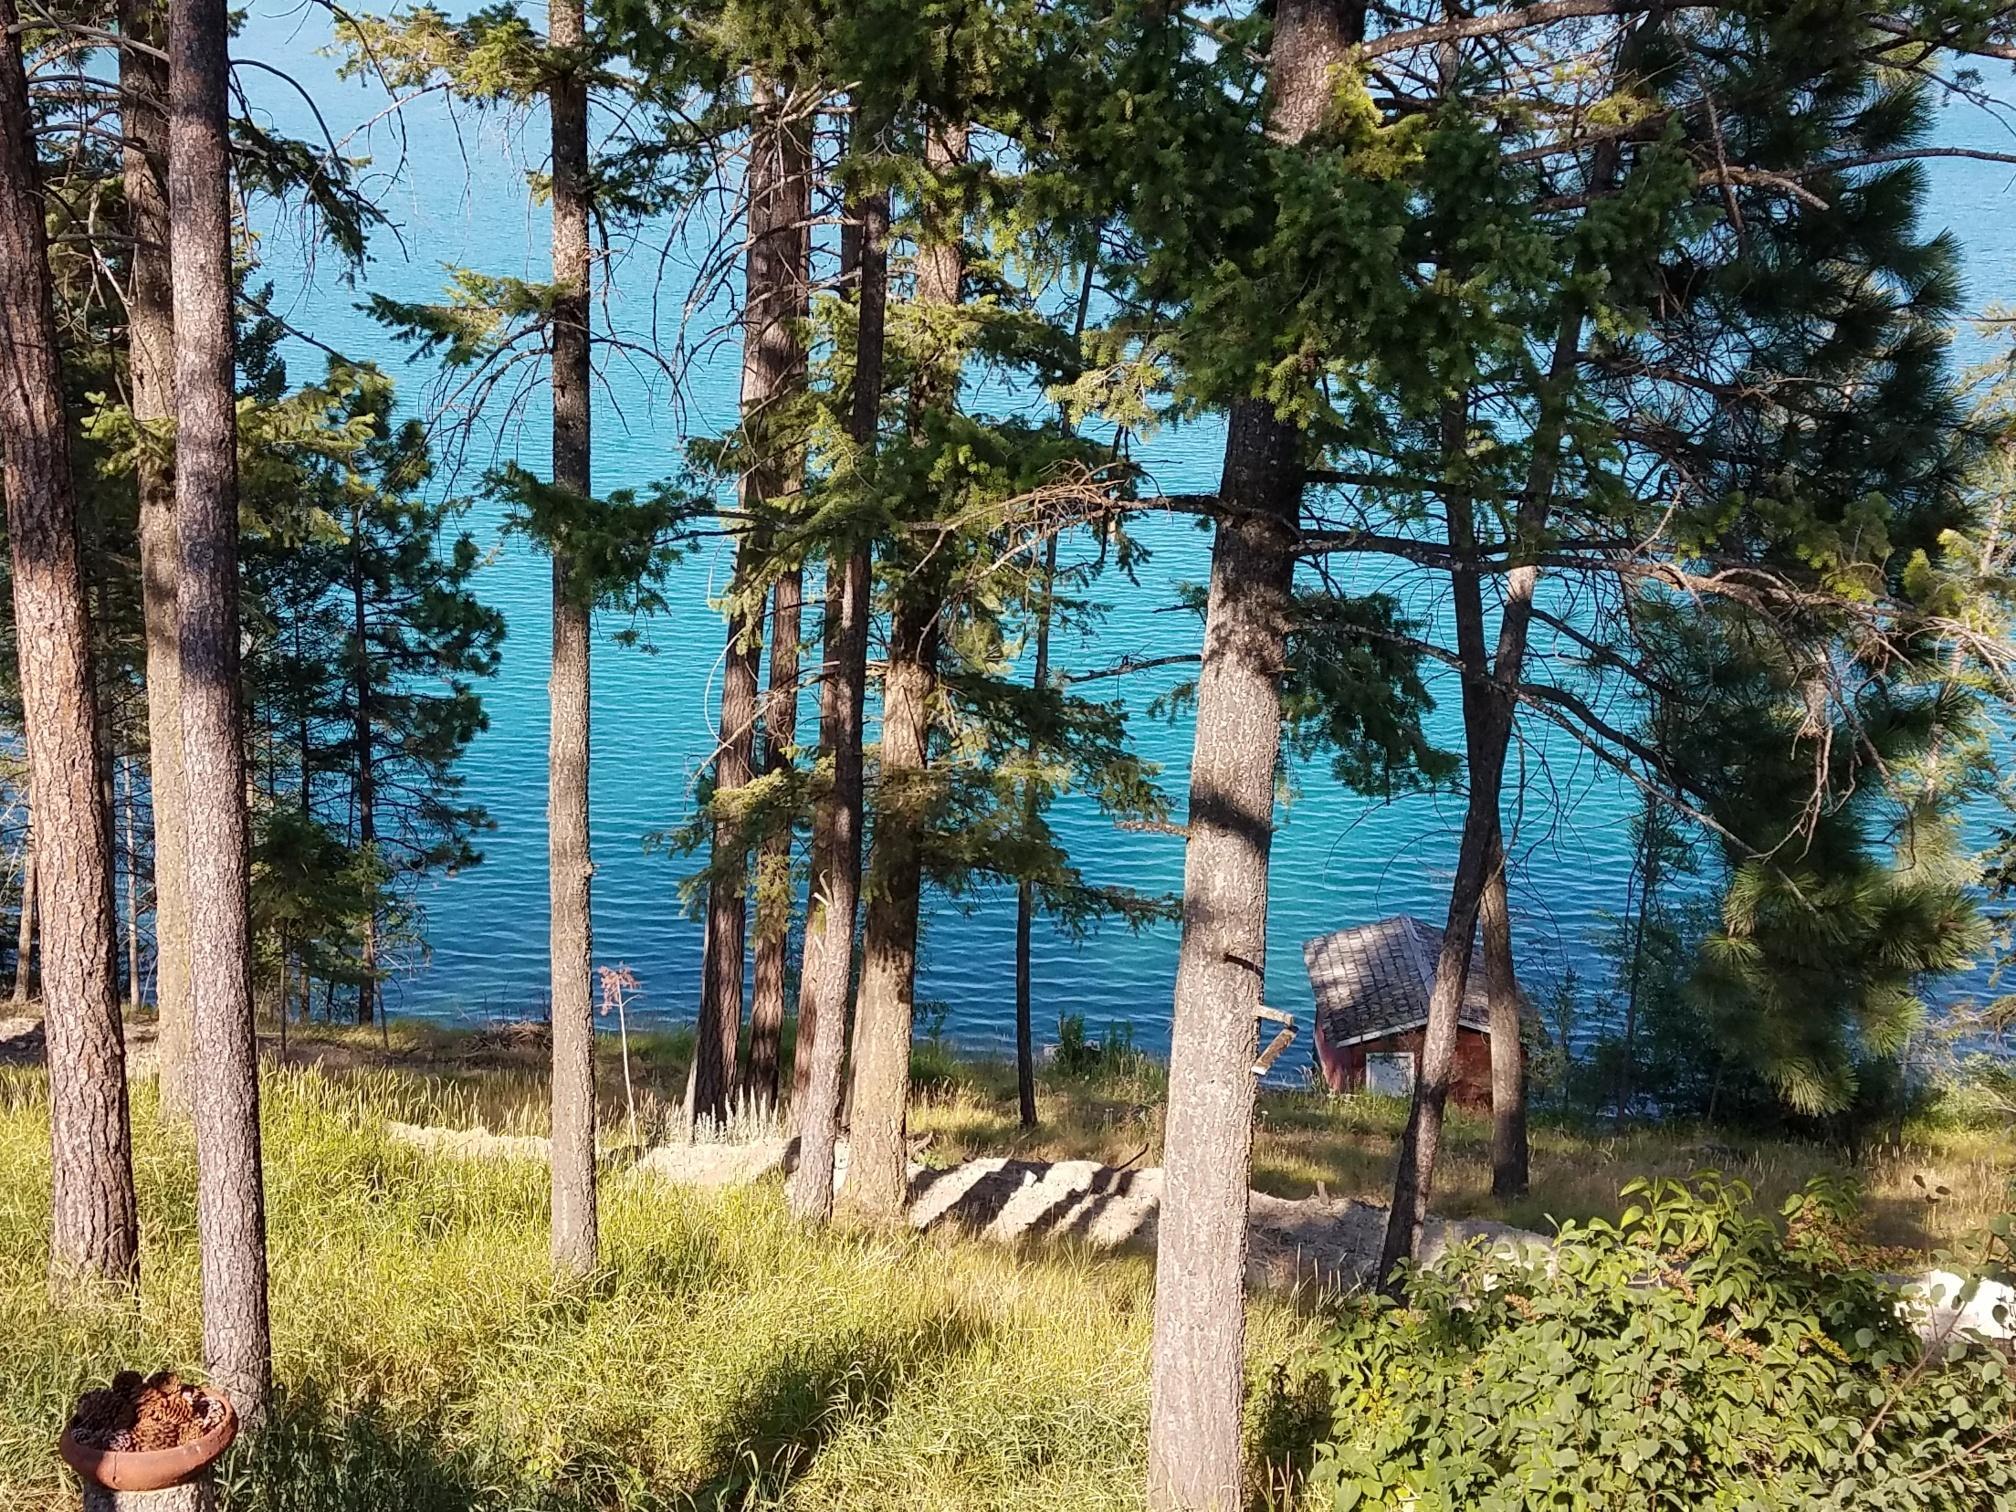 340 N Foys Lake Drive, Kalispell, MT 59901